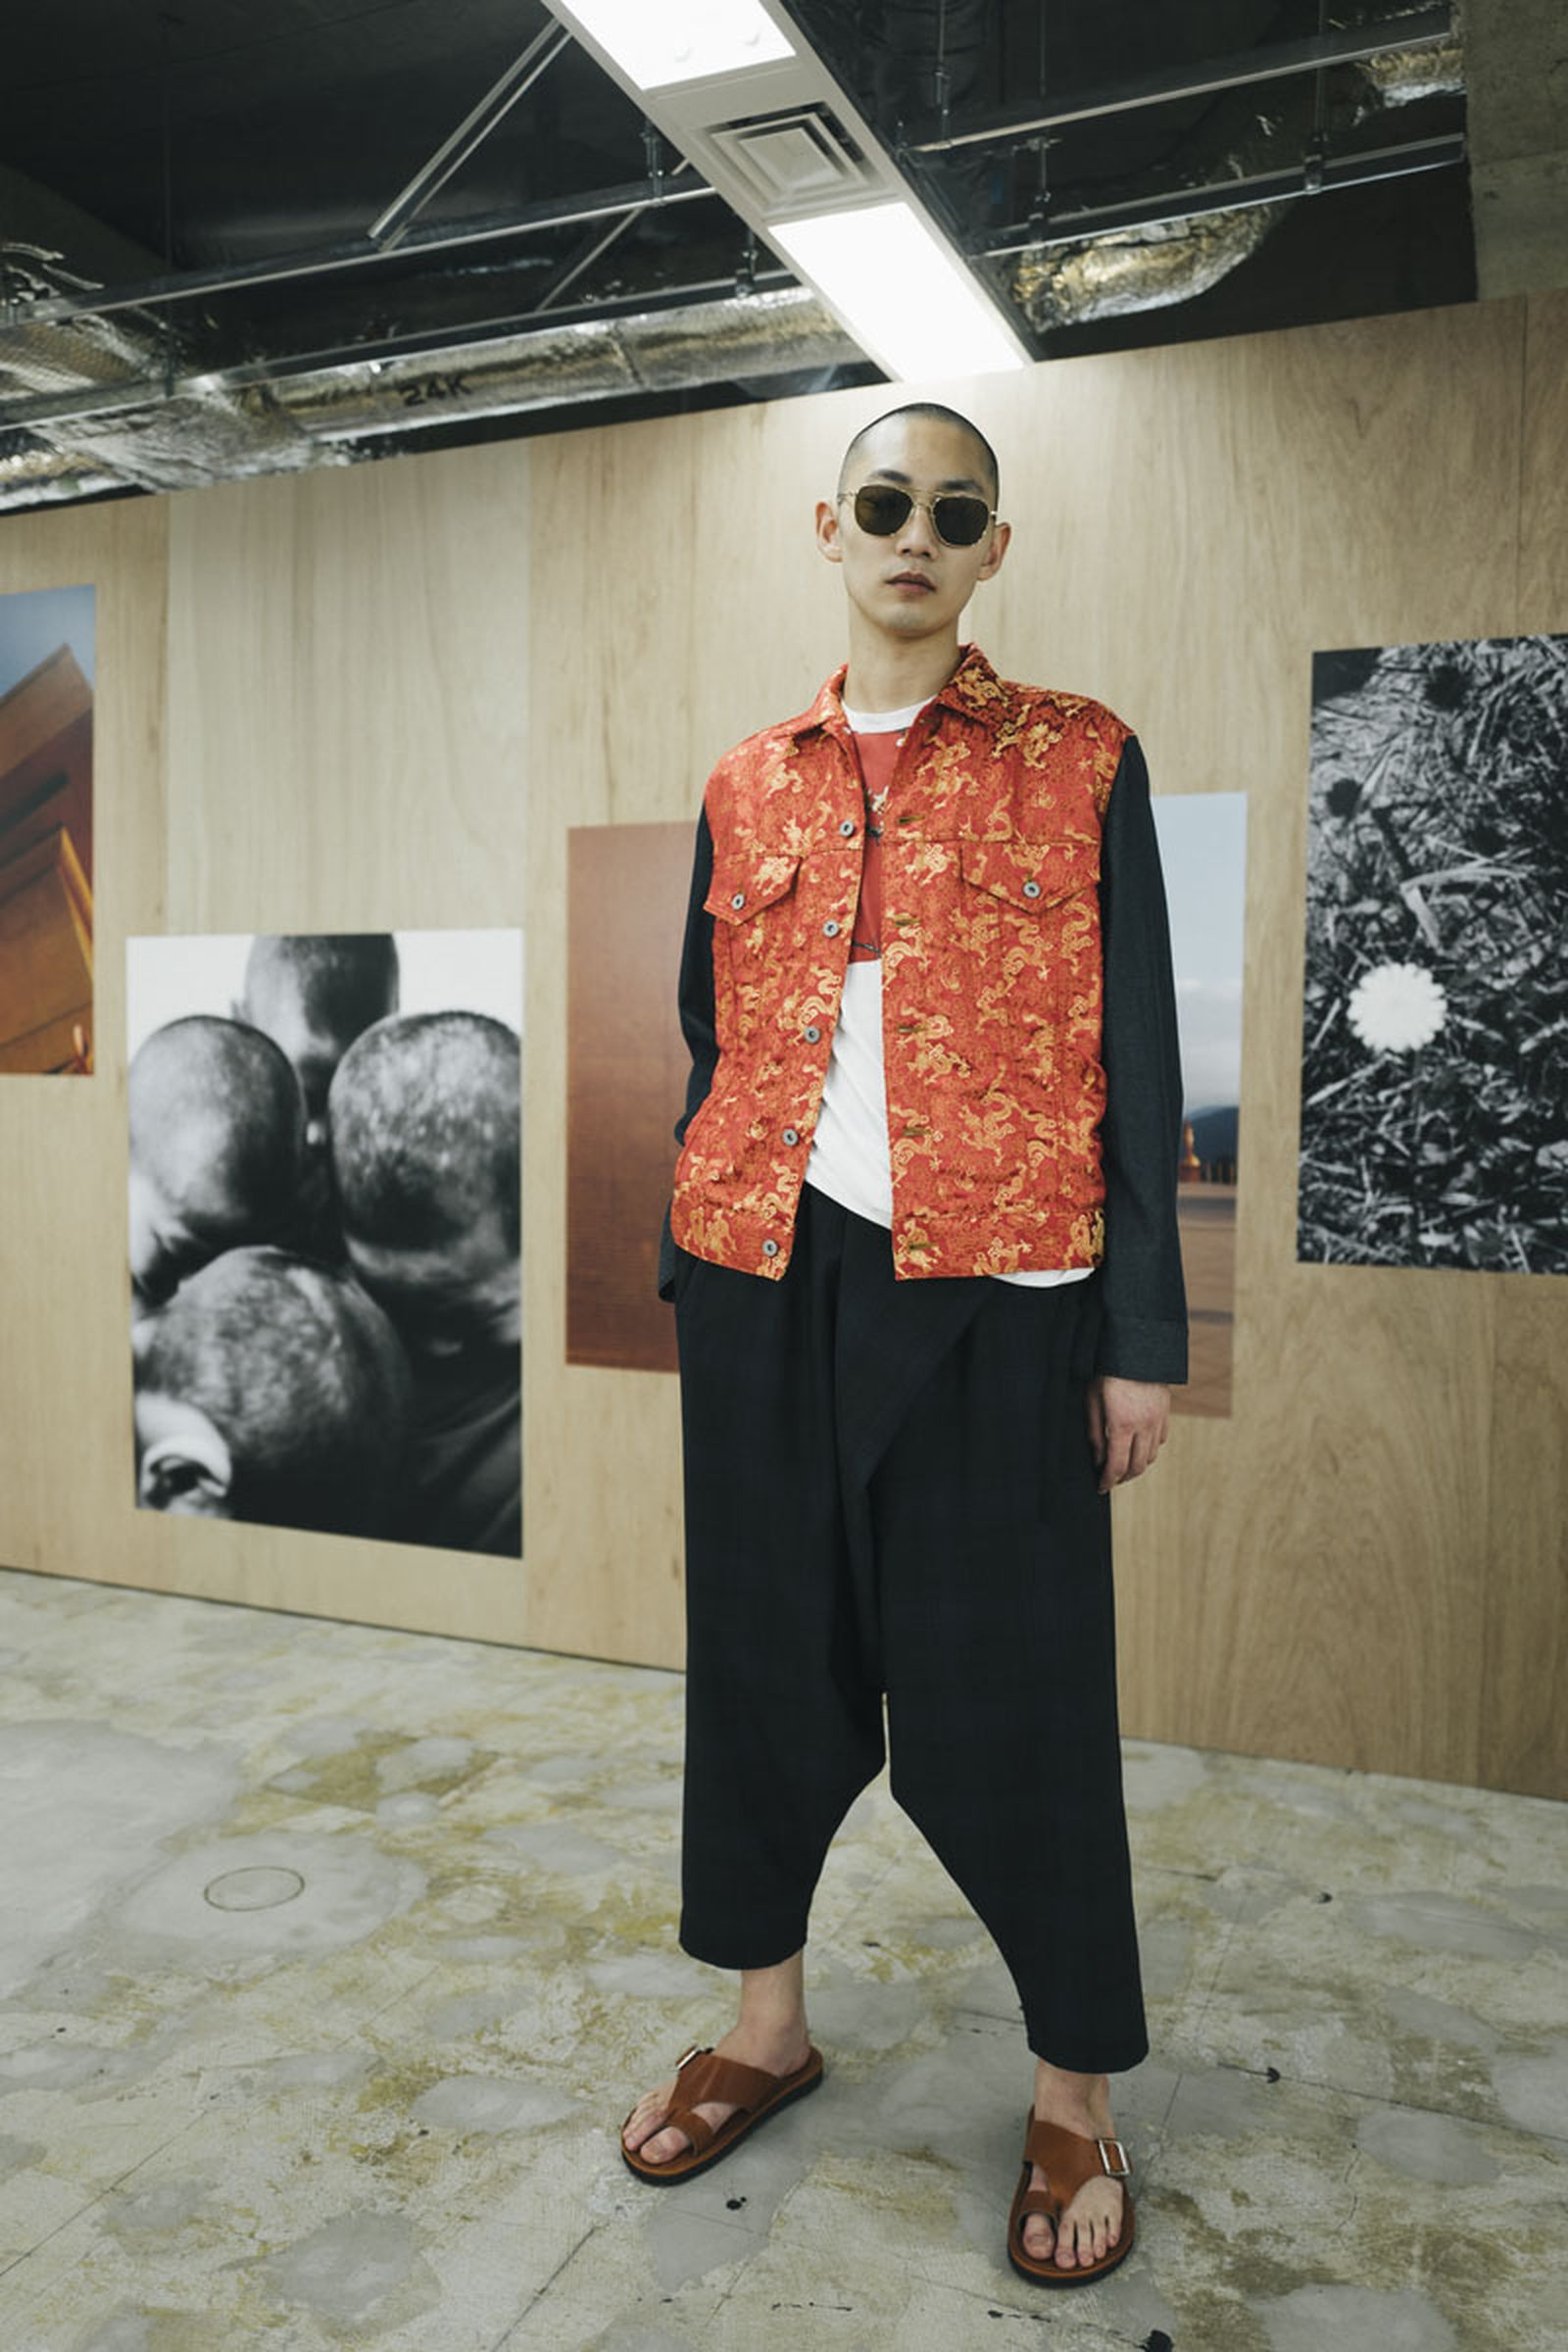 junya-watanabe-spring-summer-2022-collection-16